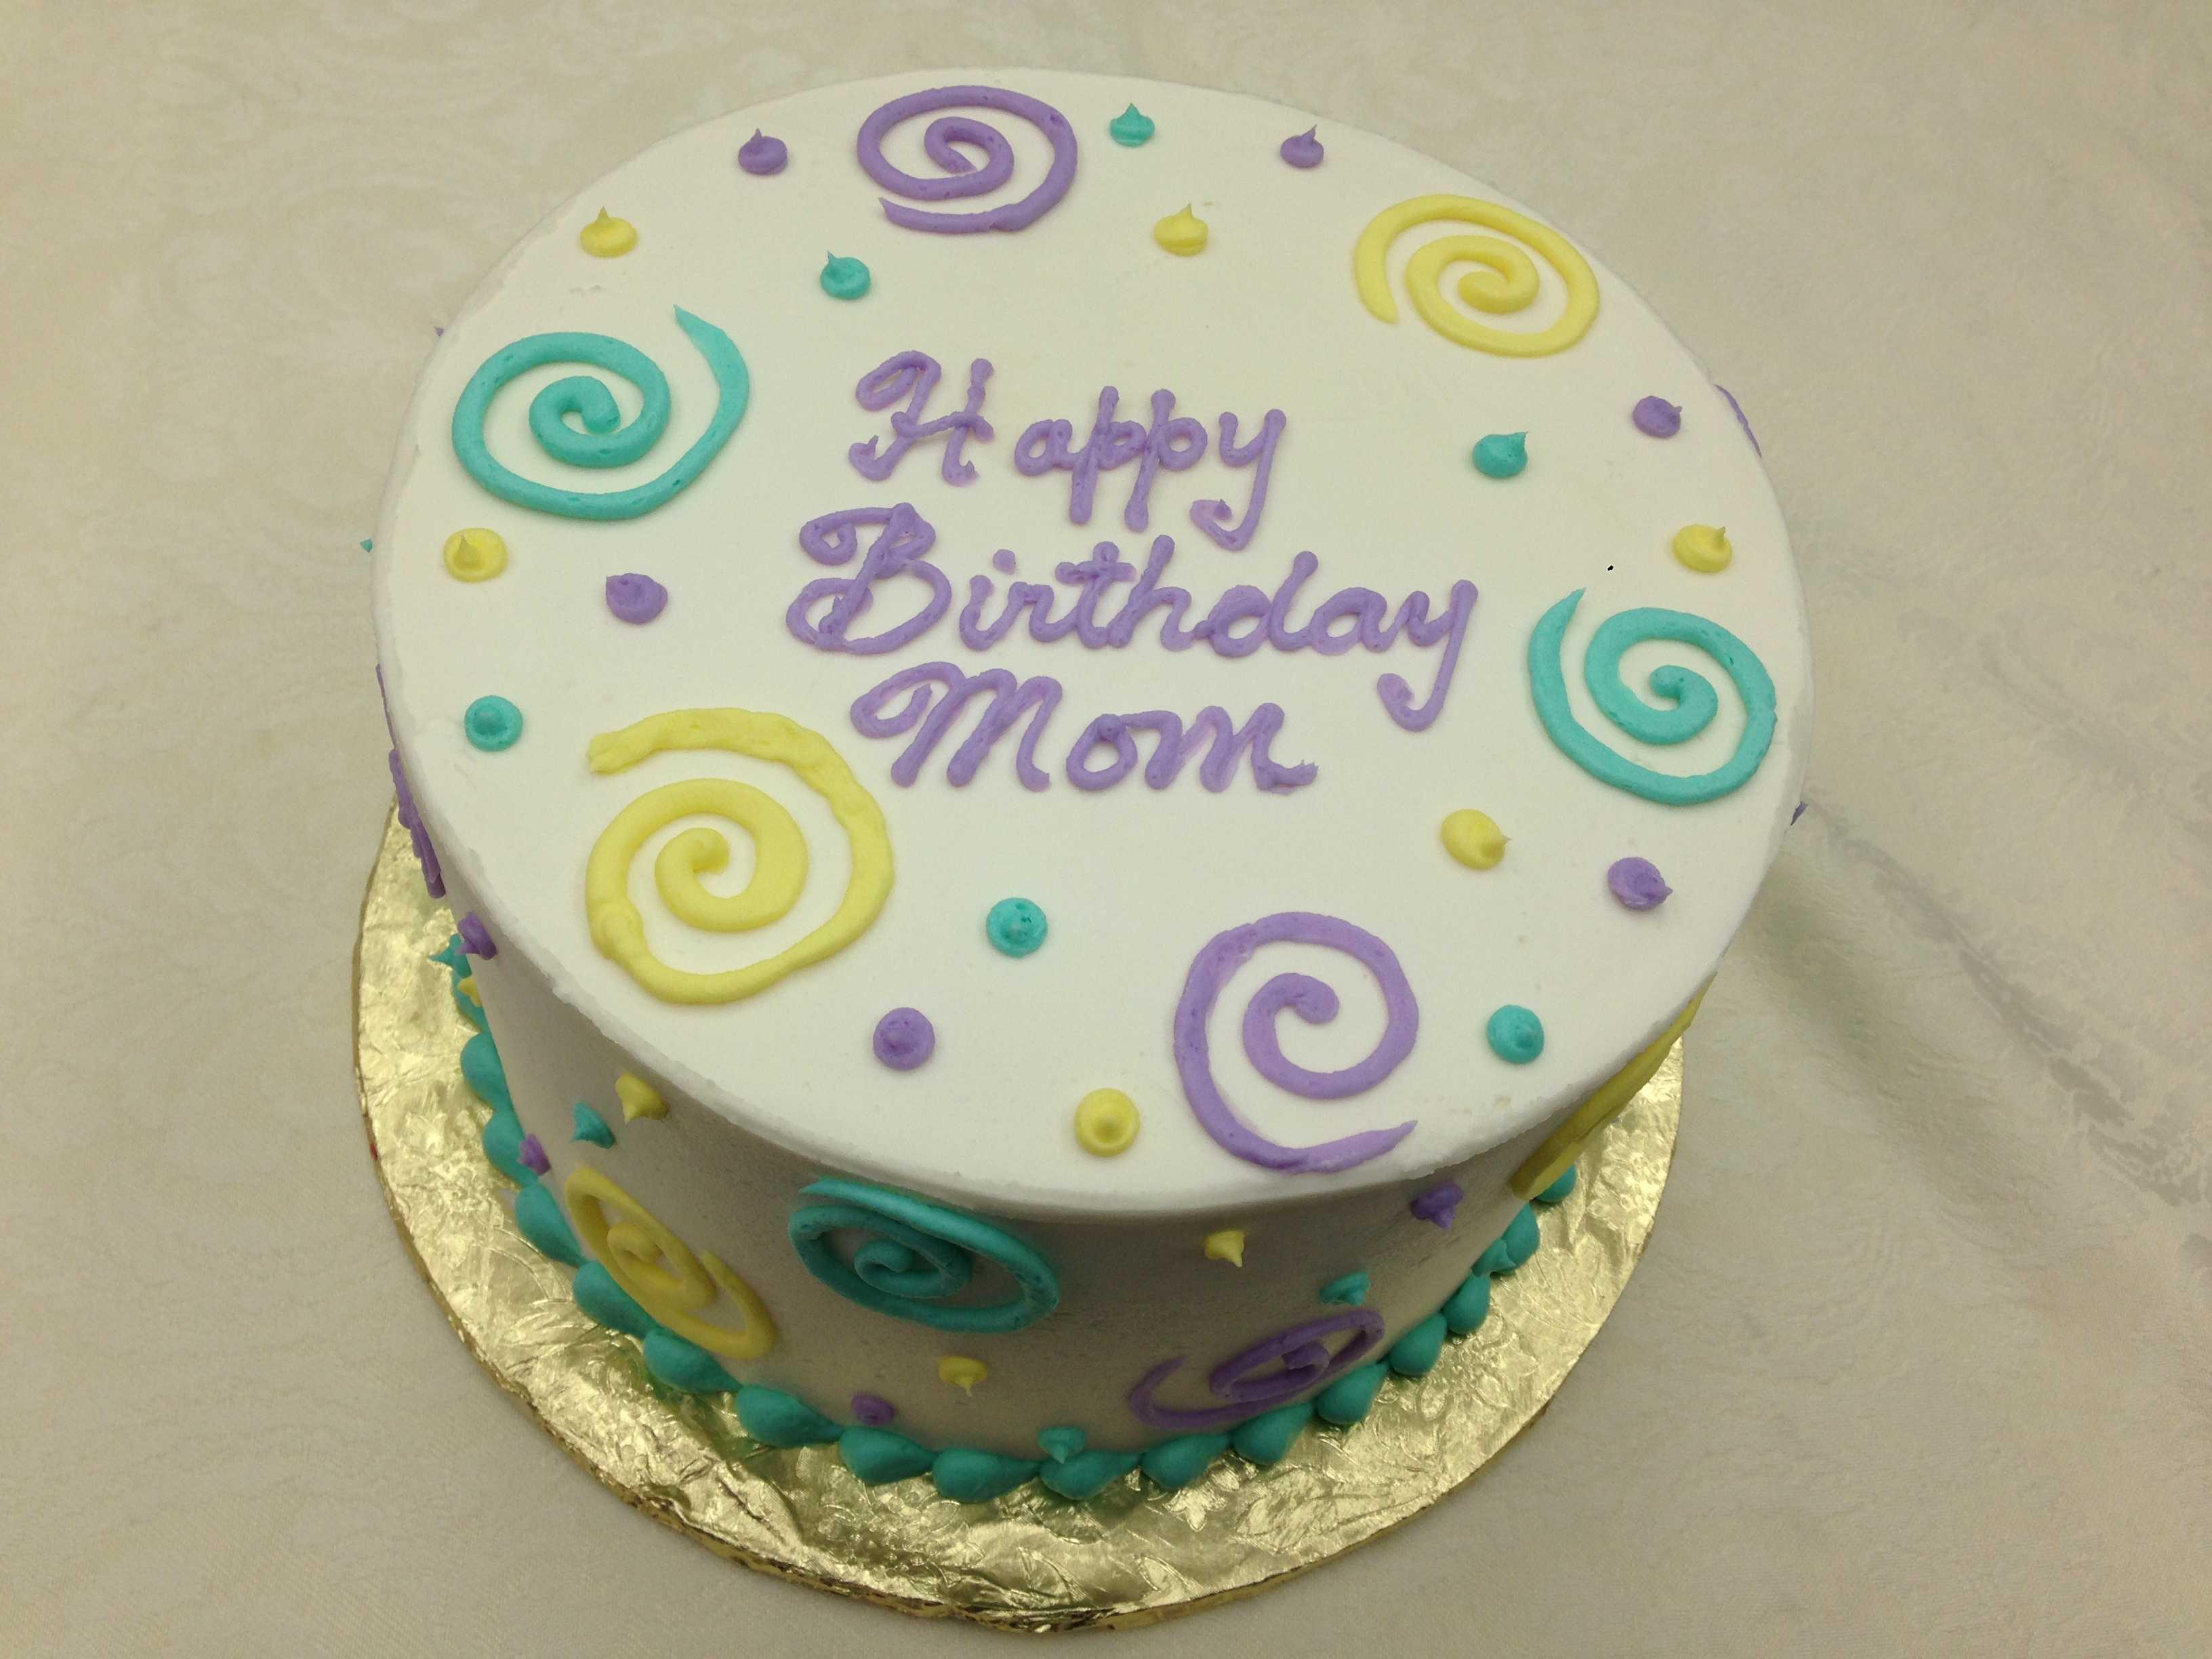 birthday cake with dots and swirls